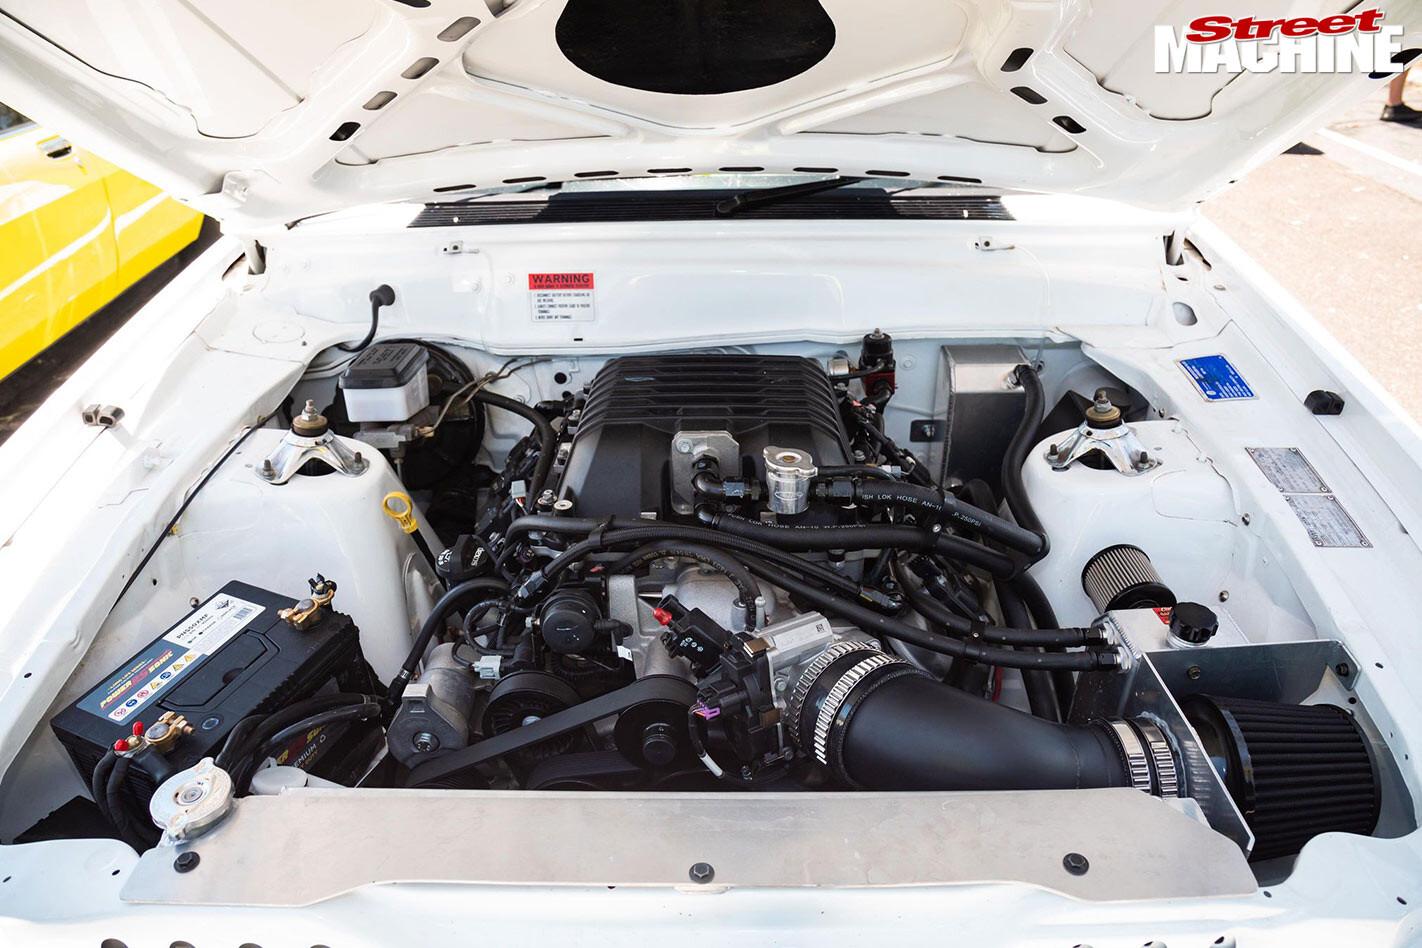 Ford Falcon XD panel van engine bay